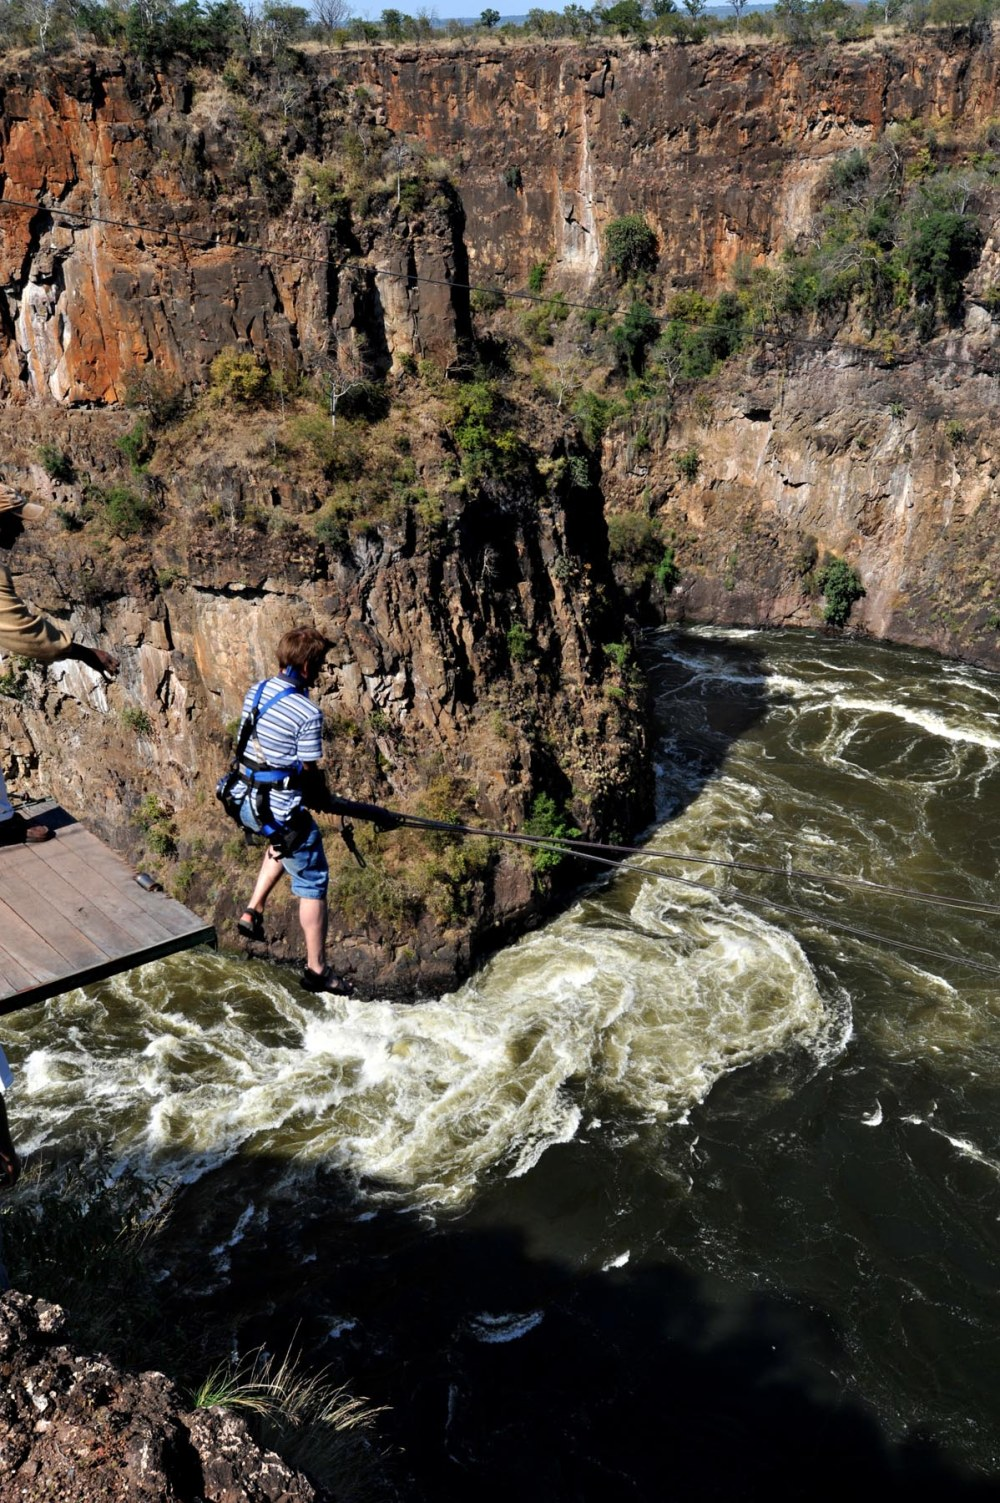 Gorge swing Victoriafallene